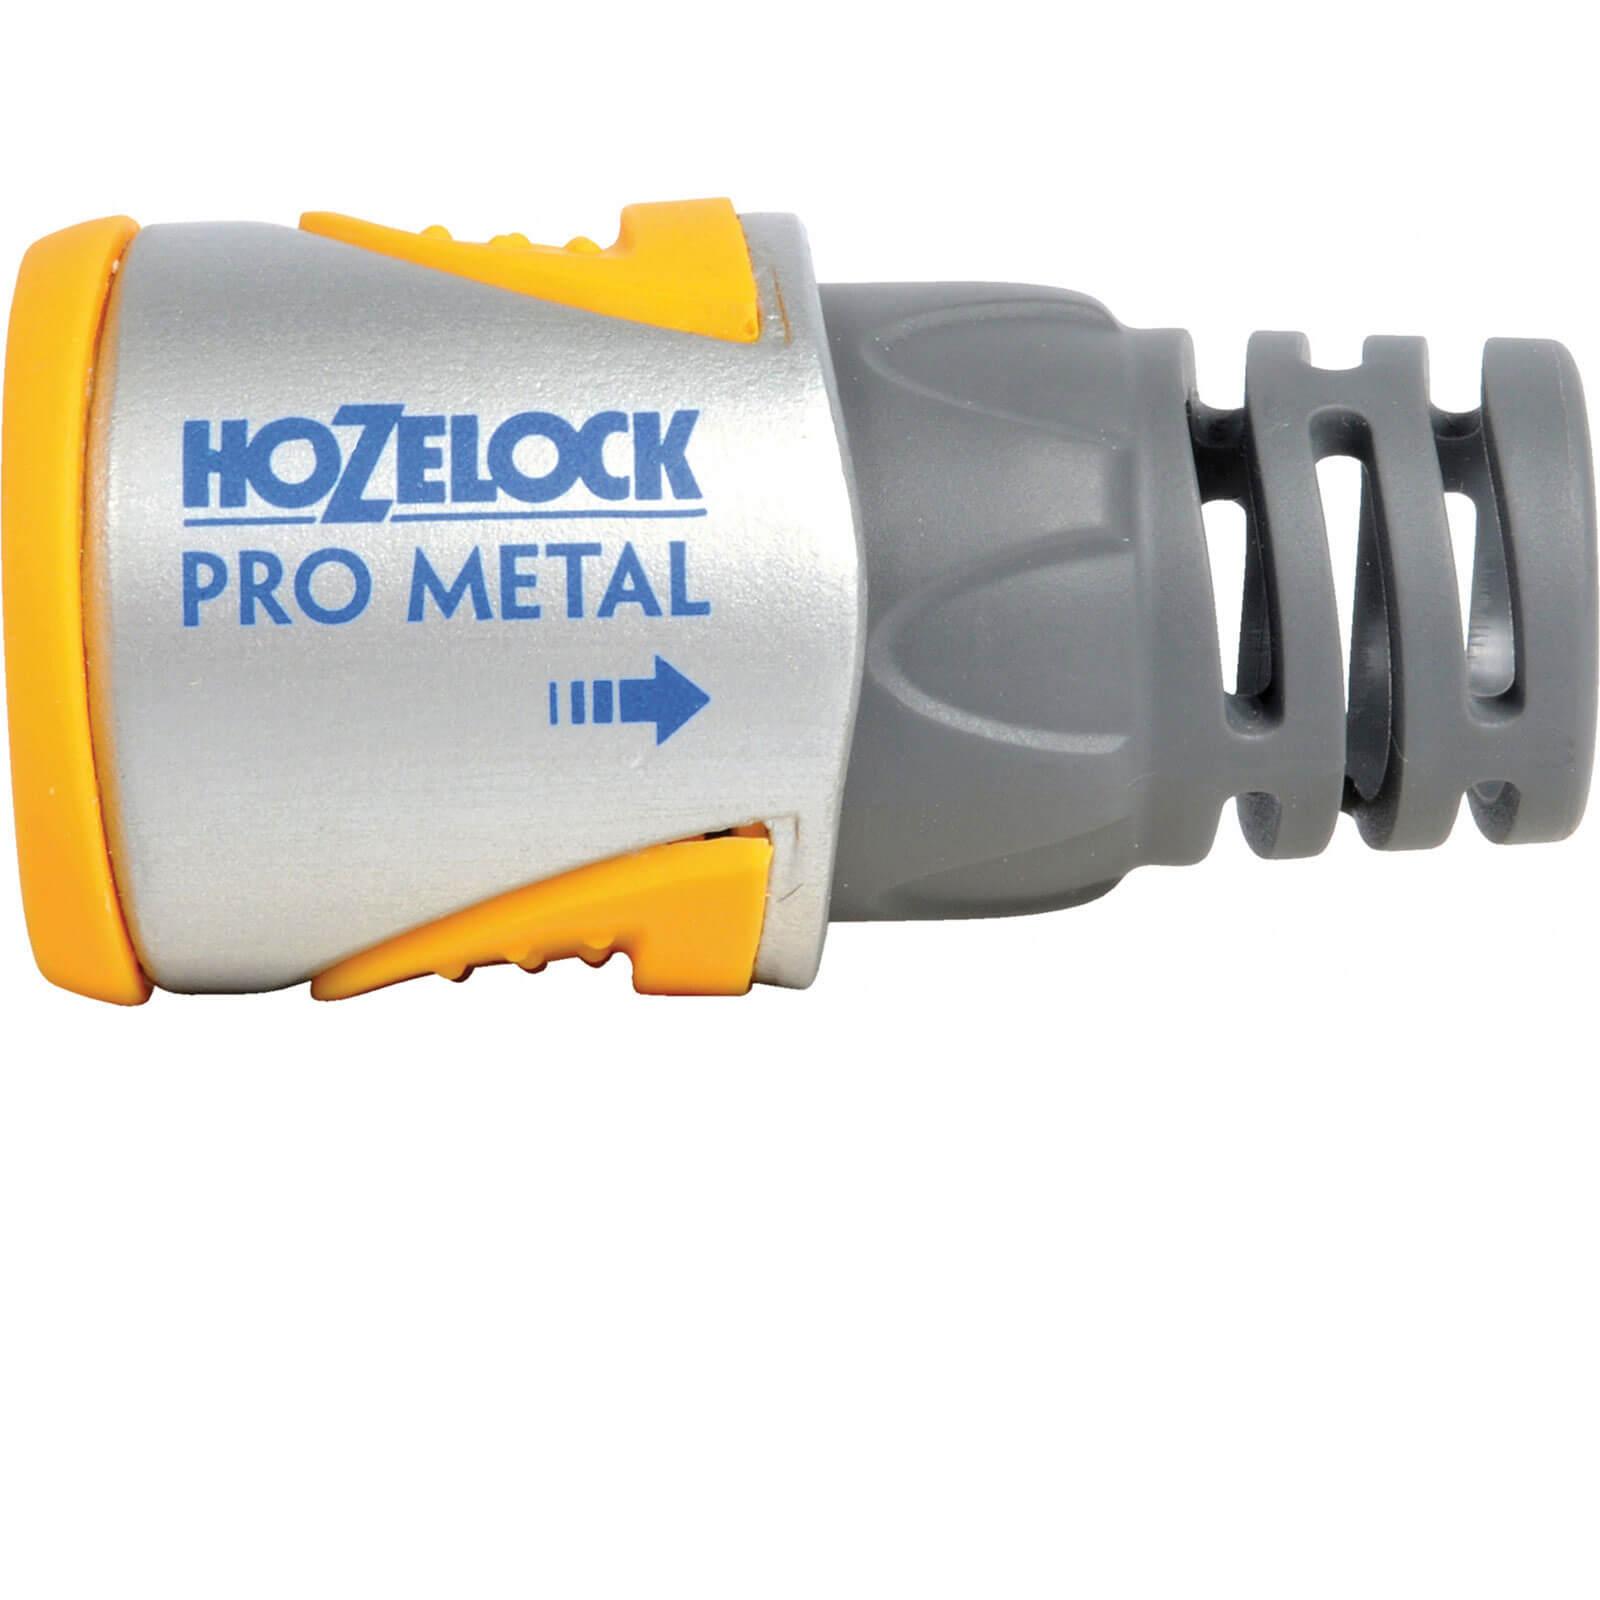 Hozelock Pro Metal Hose End Connector for 12.5mm Hose